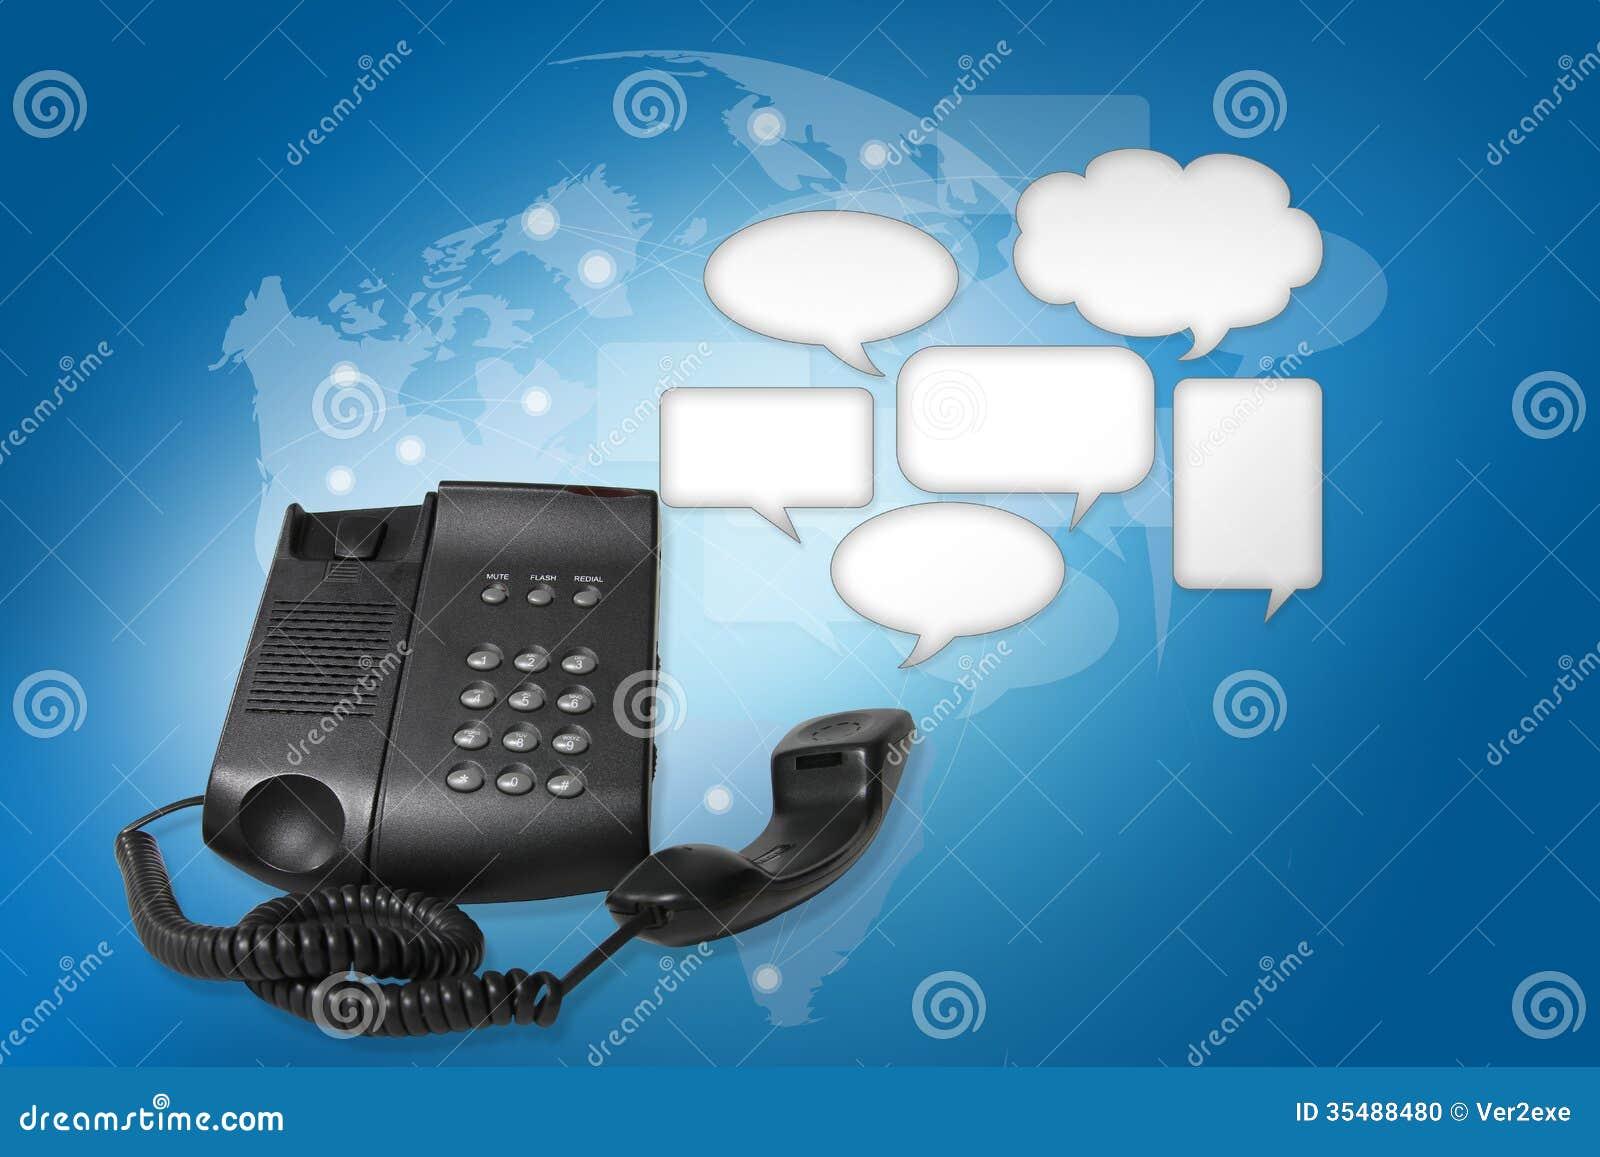 Talk On The Phone Clipart